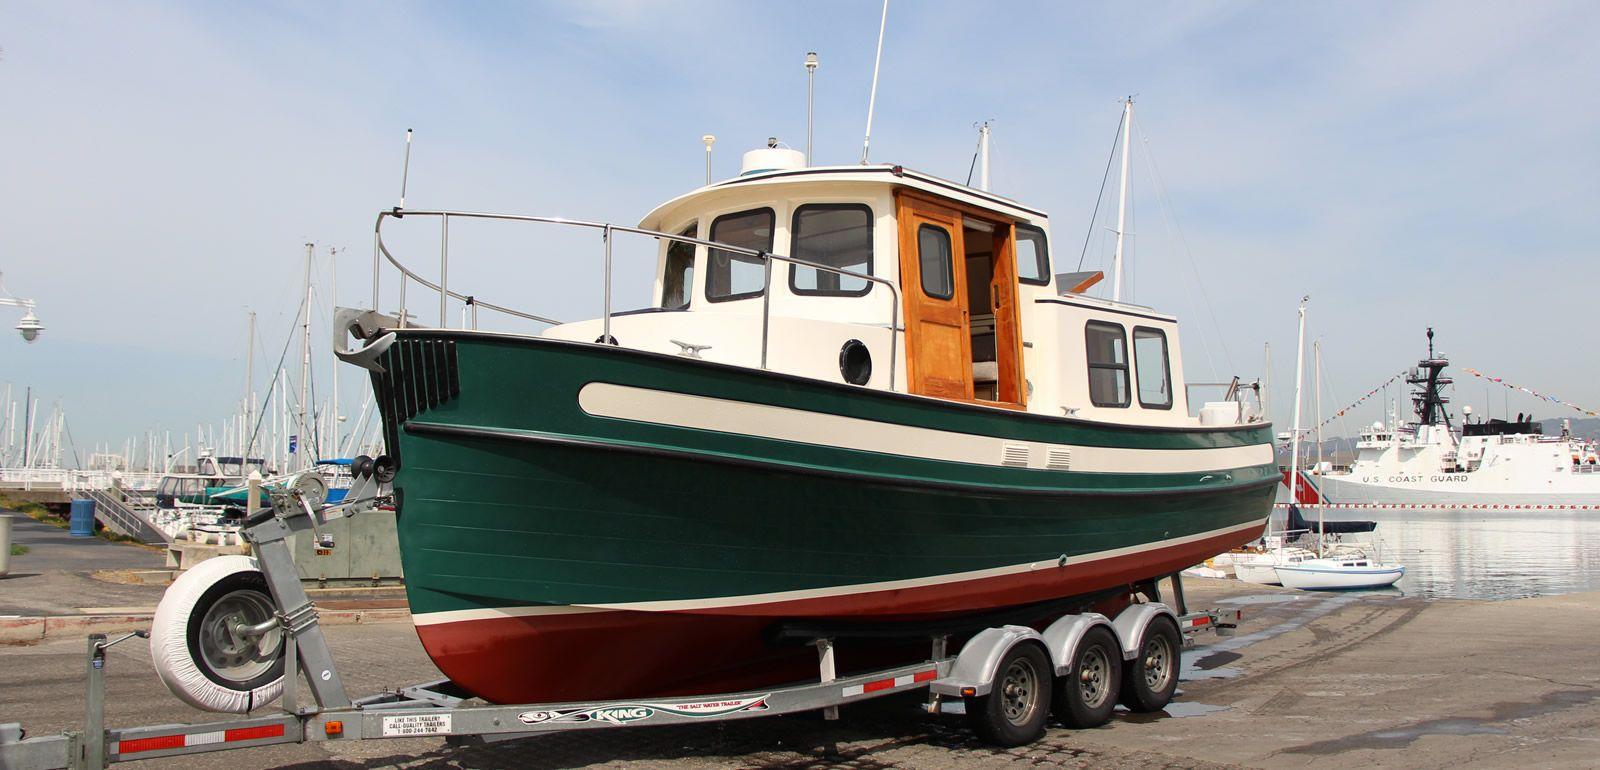 Nordic Tug 26   Ships   Trawler yacht, Yacht broker, Boat